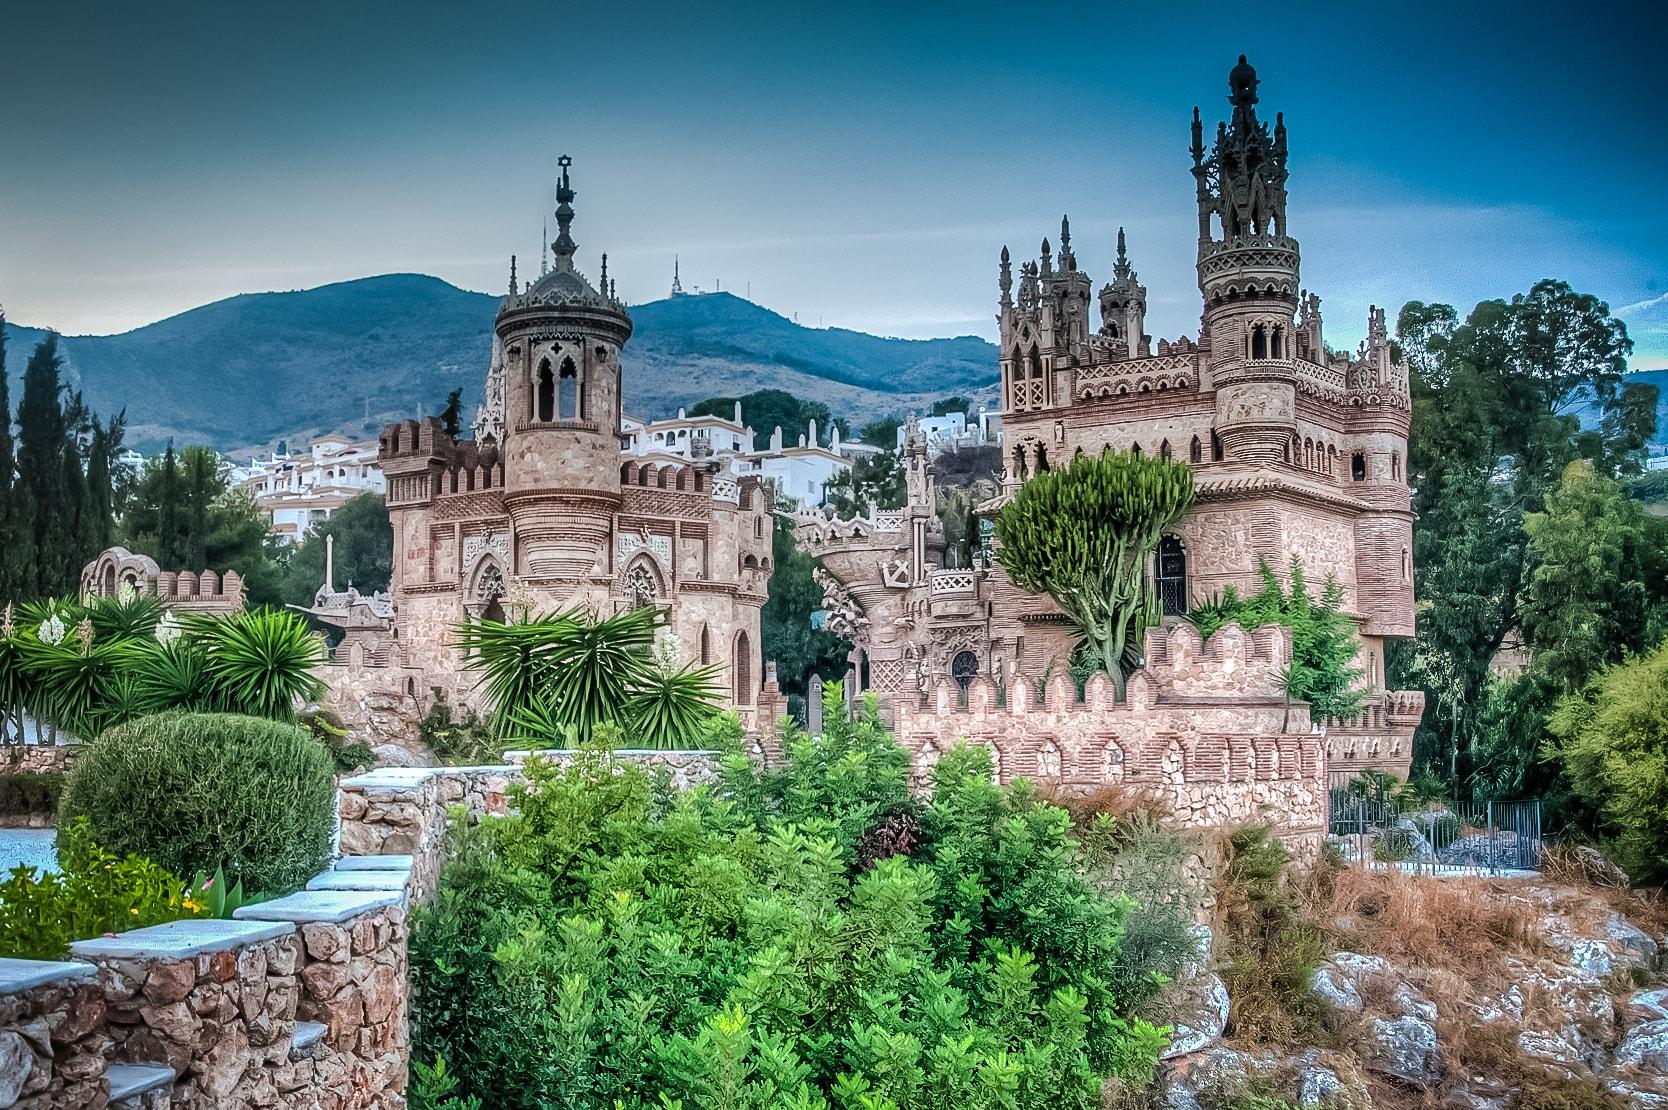 colomares-castle-benalmadena-original-12464-min